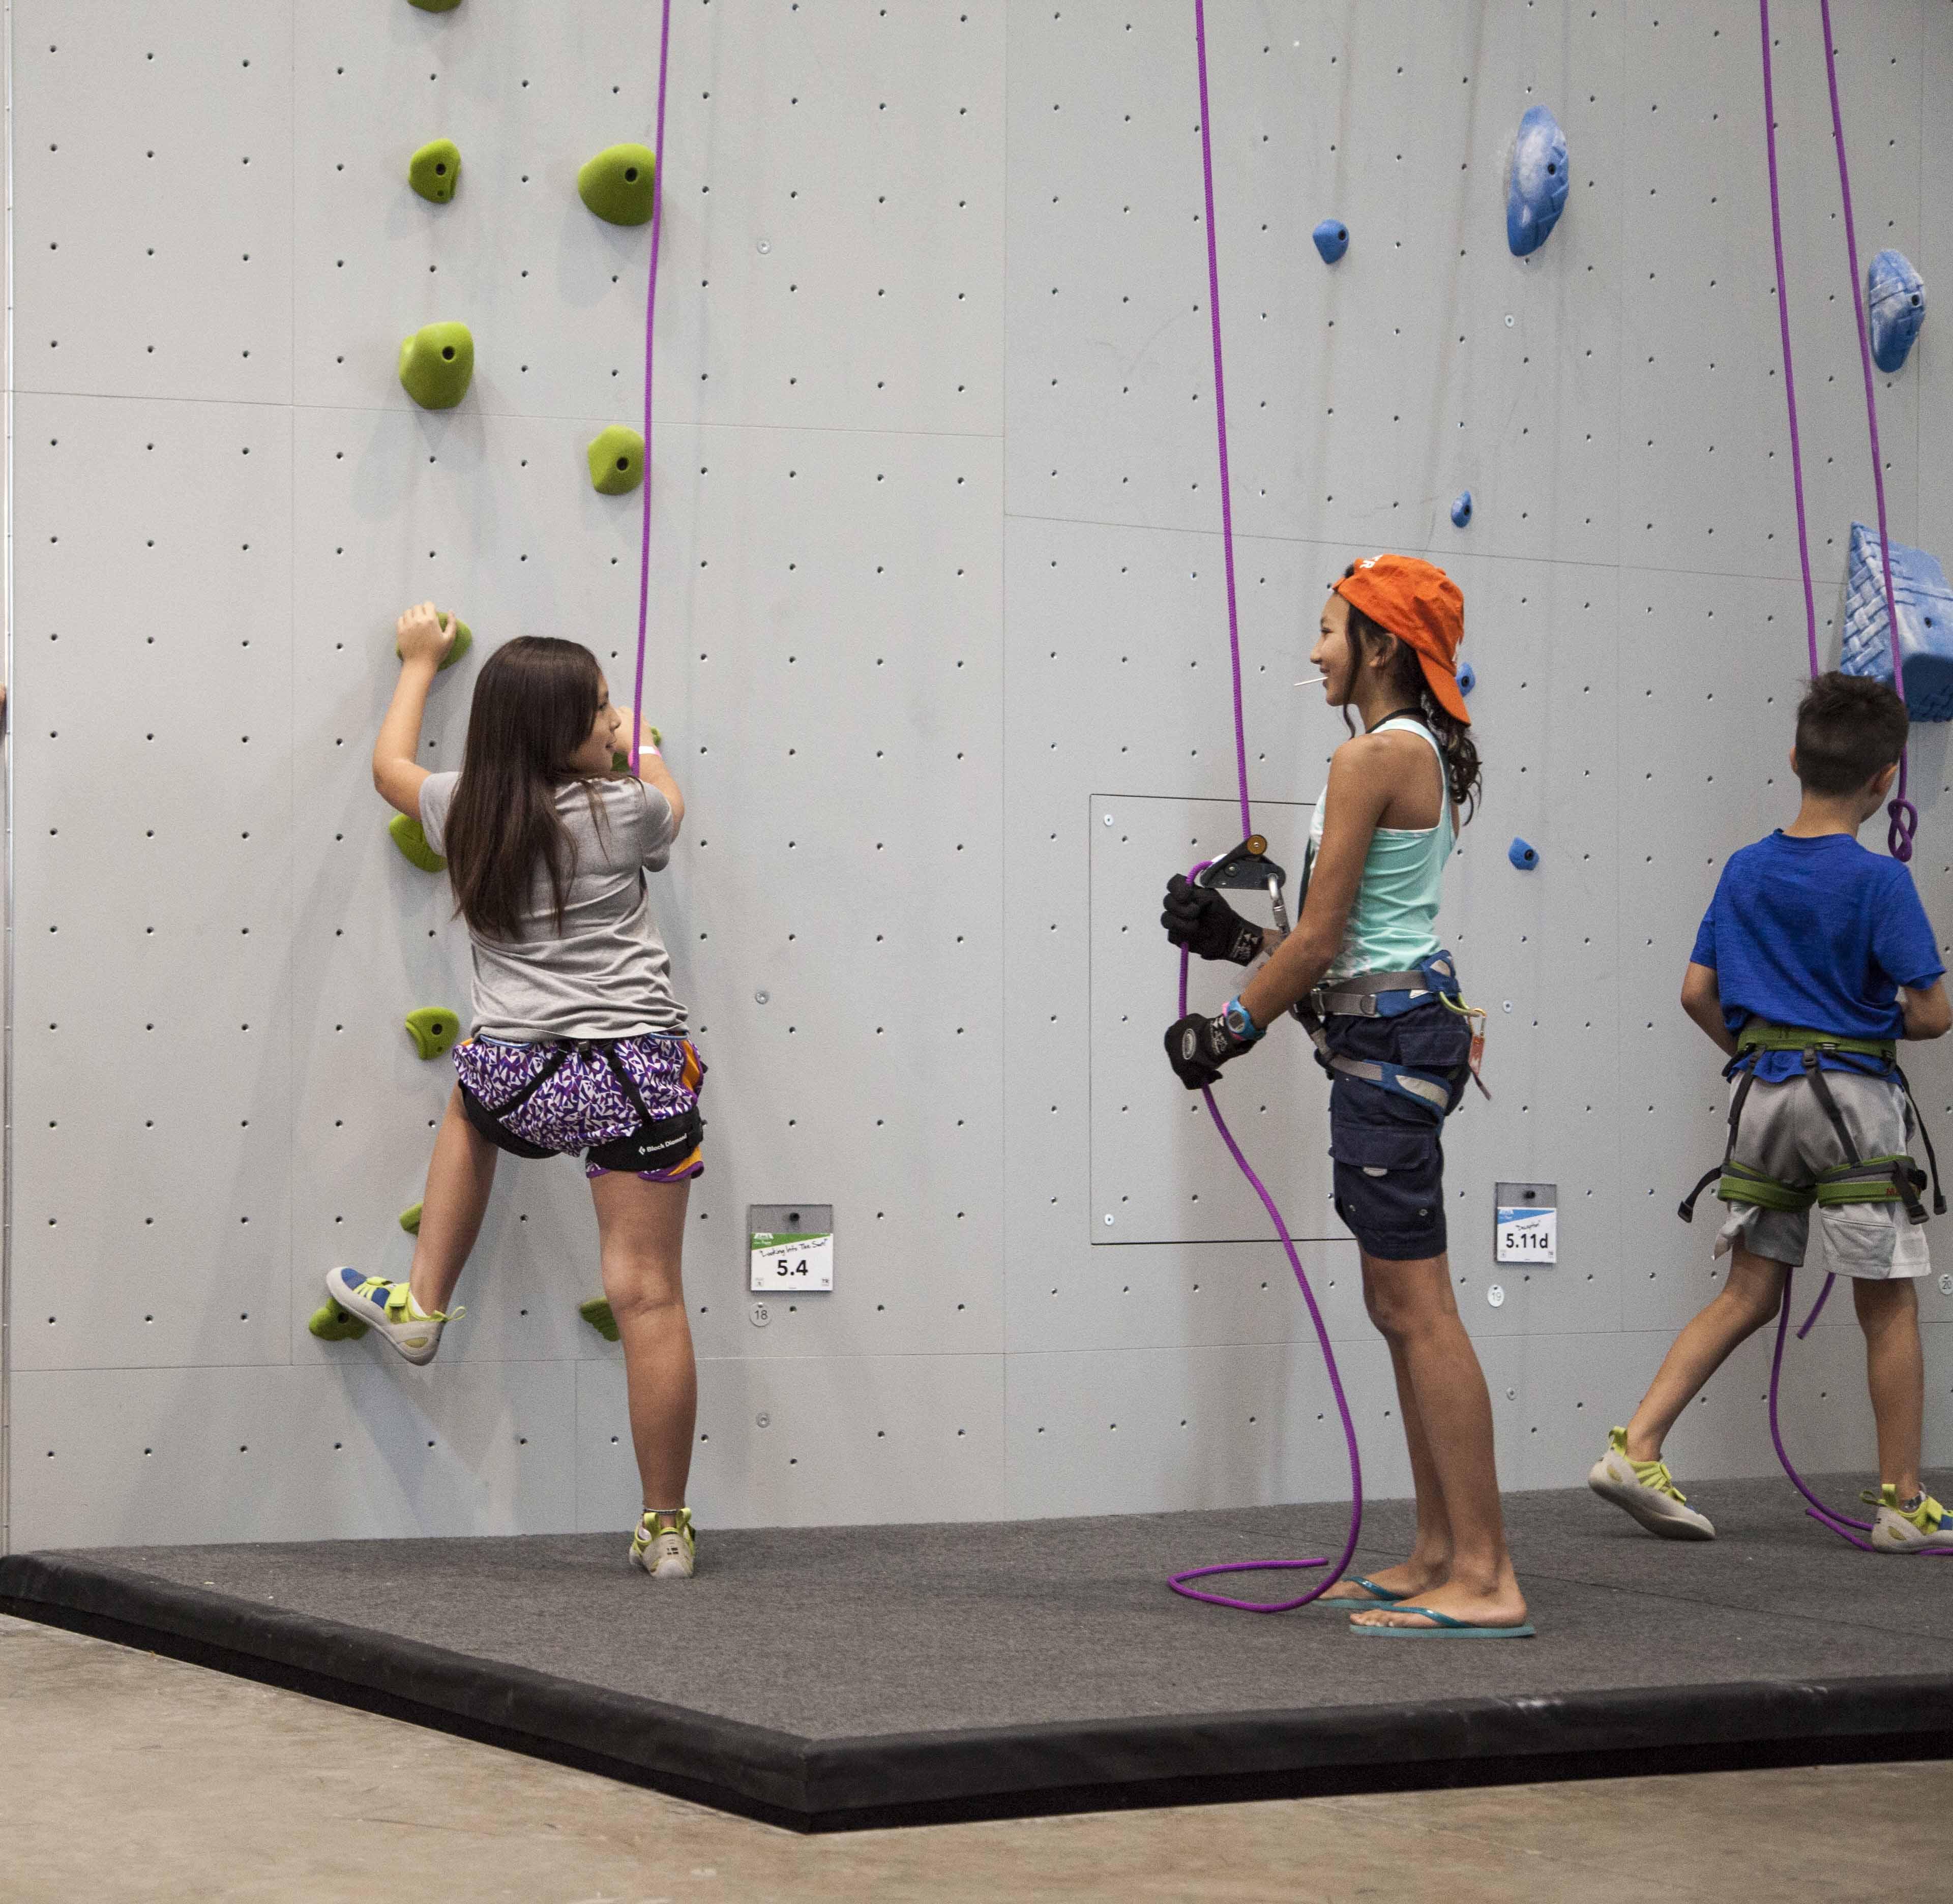 Mesa Rim Climbing And Fitness